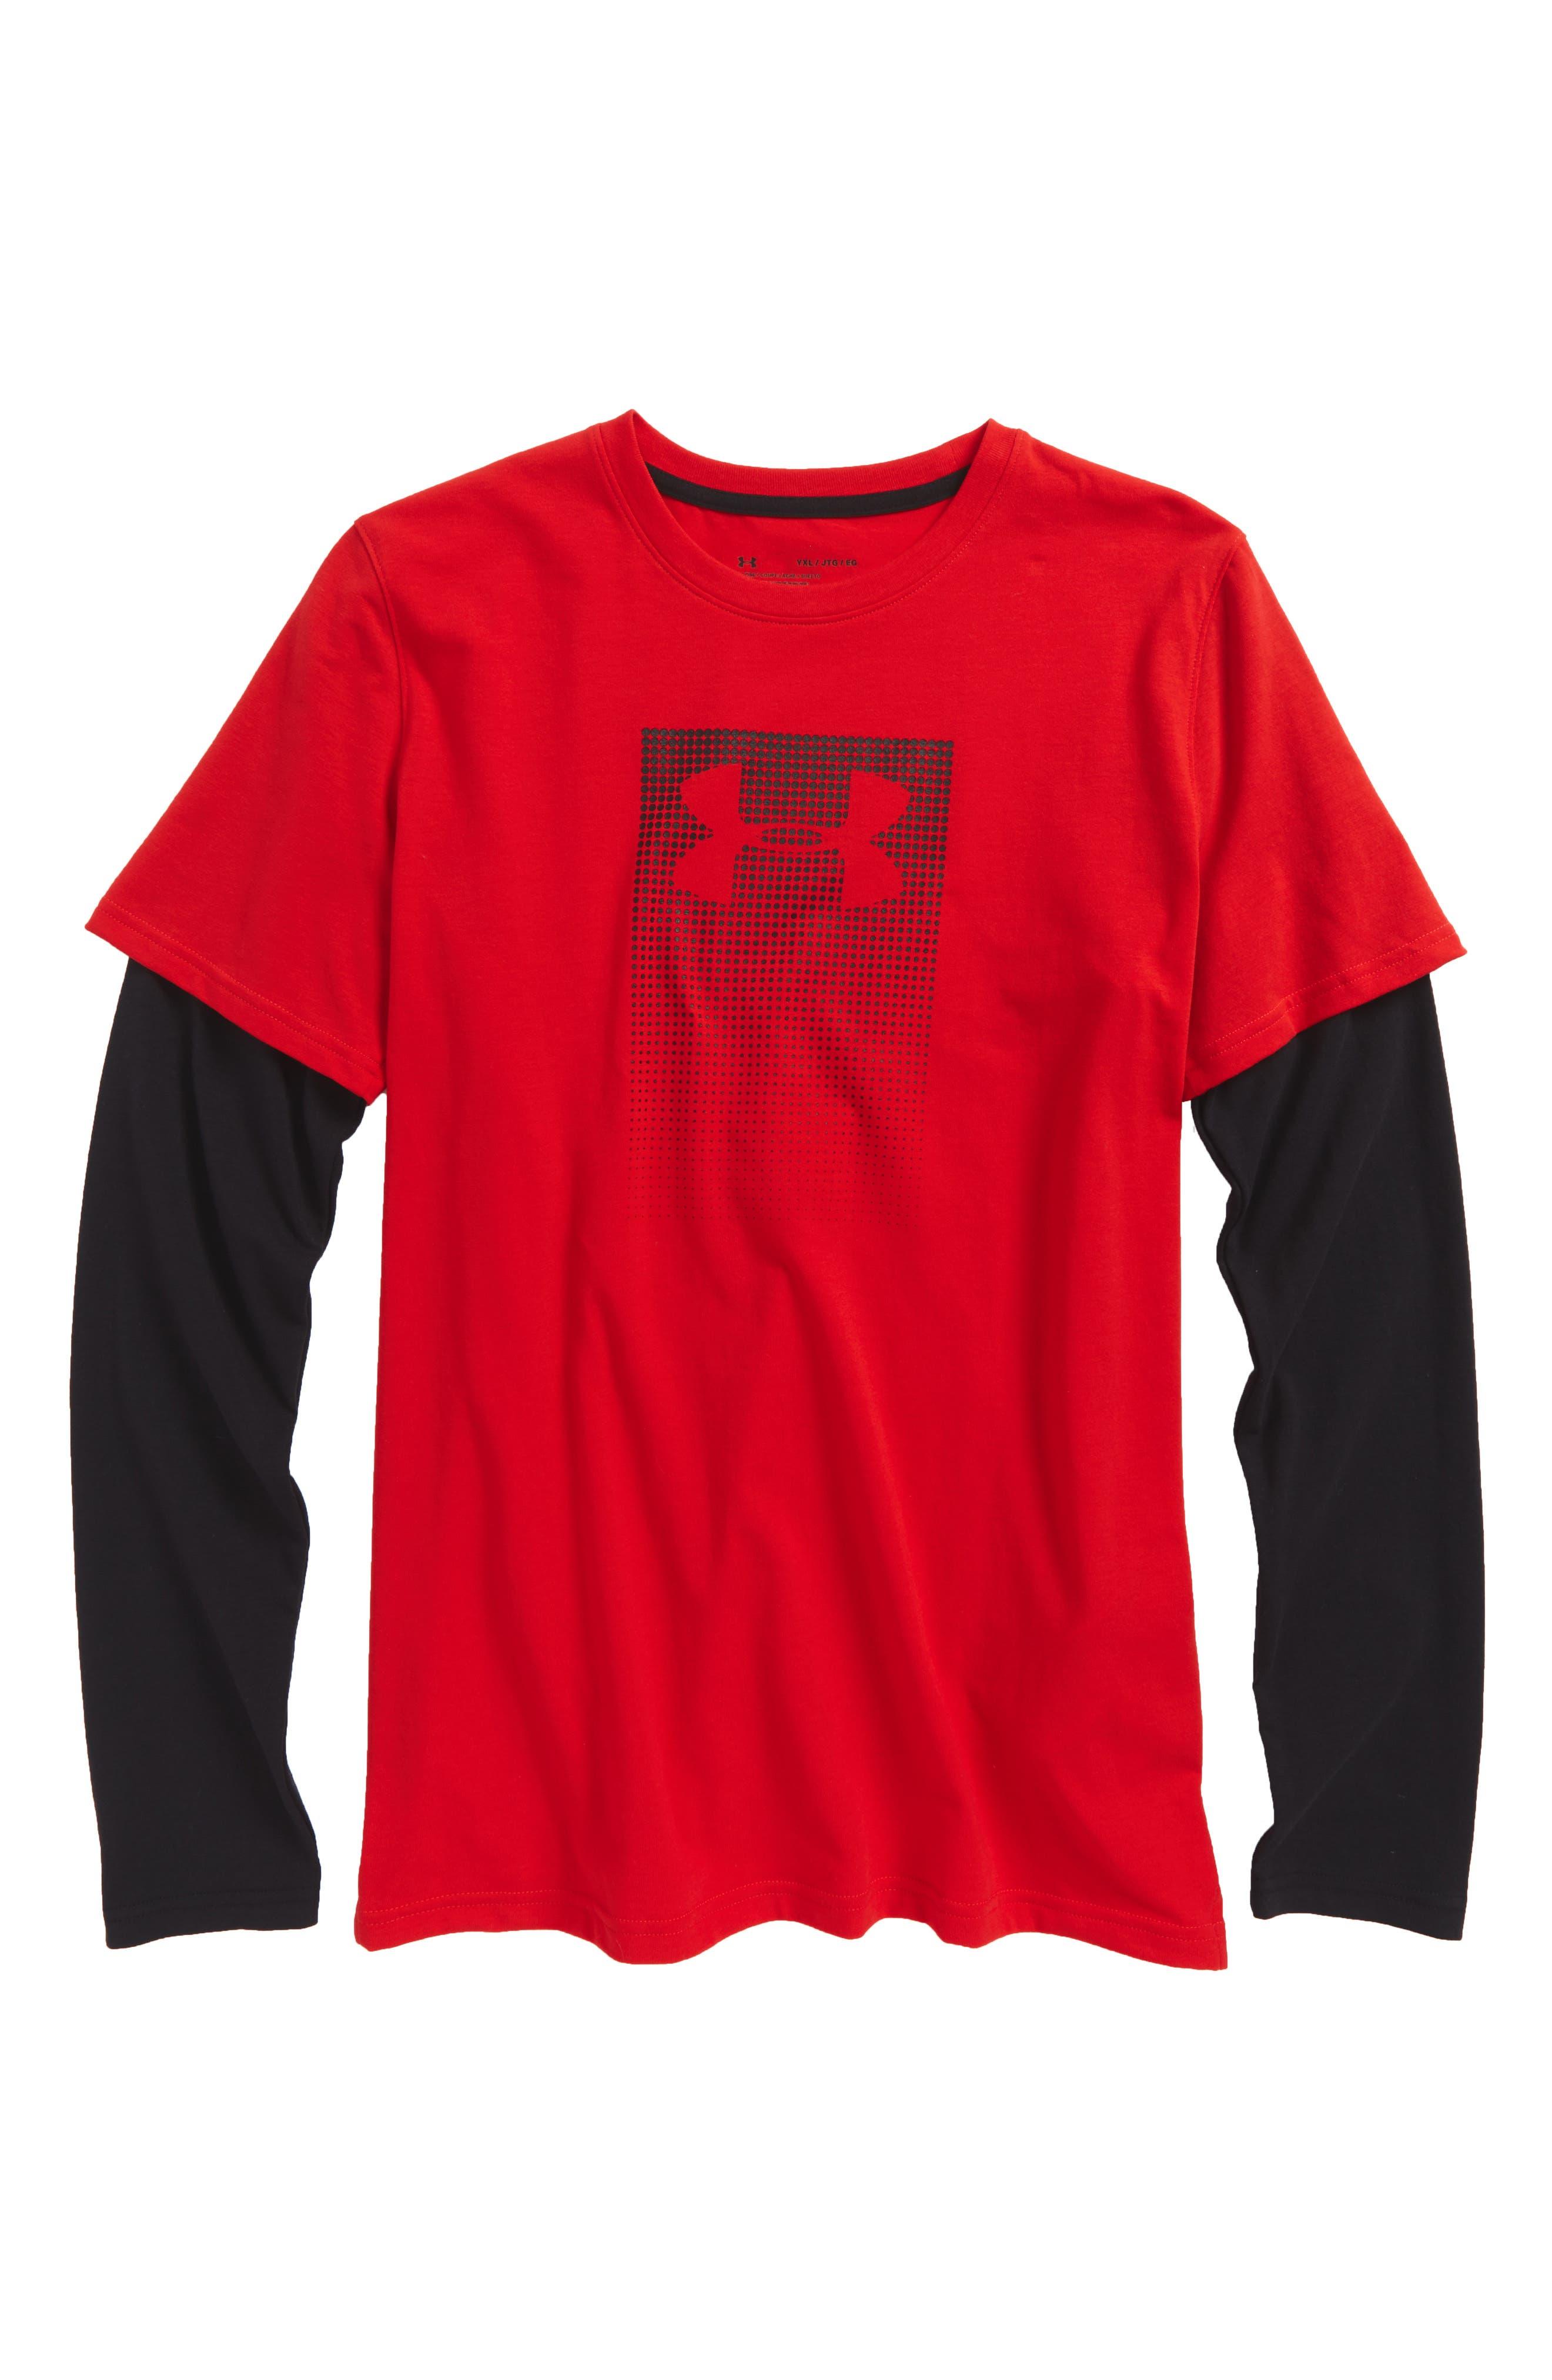 Long Sleeve HeatGear<sup>®</sup> T-Shirt,                         Main,                         color, Red/ Black